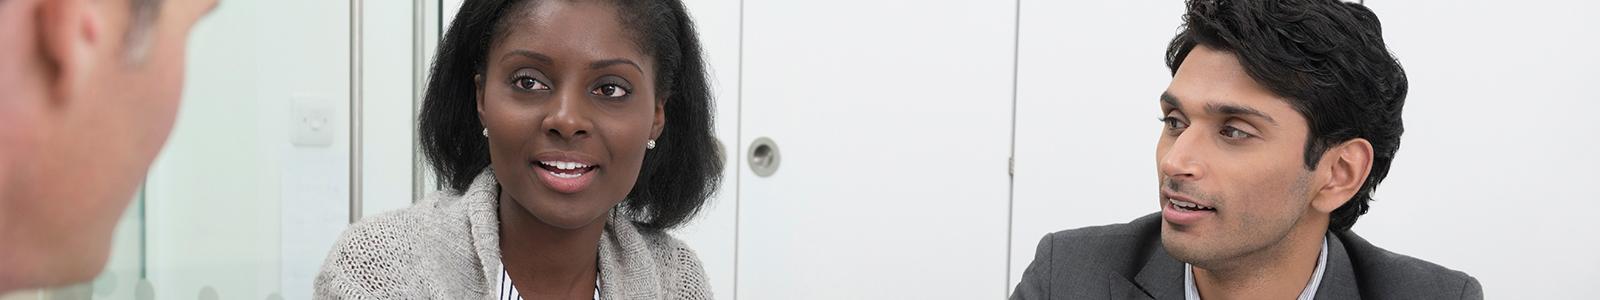 black_Woman_Office_Discussion_RGB_web_CROP